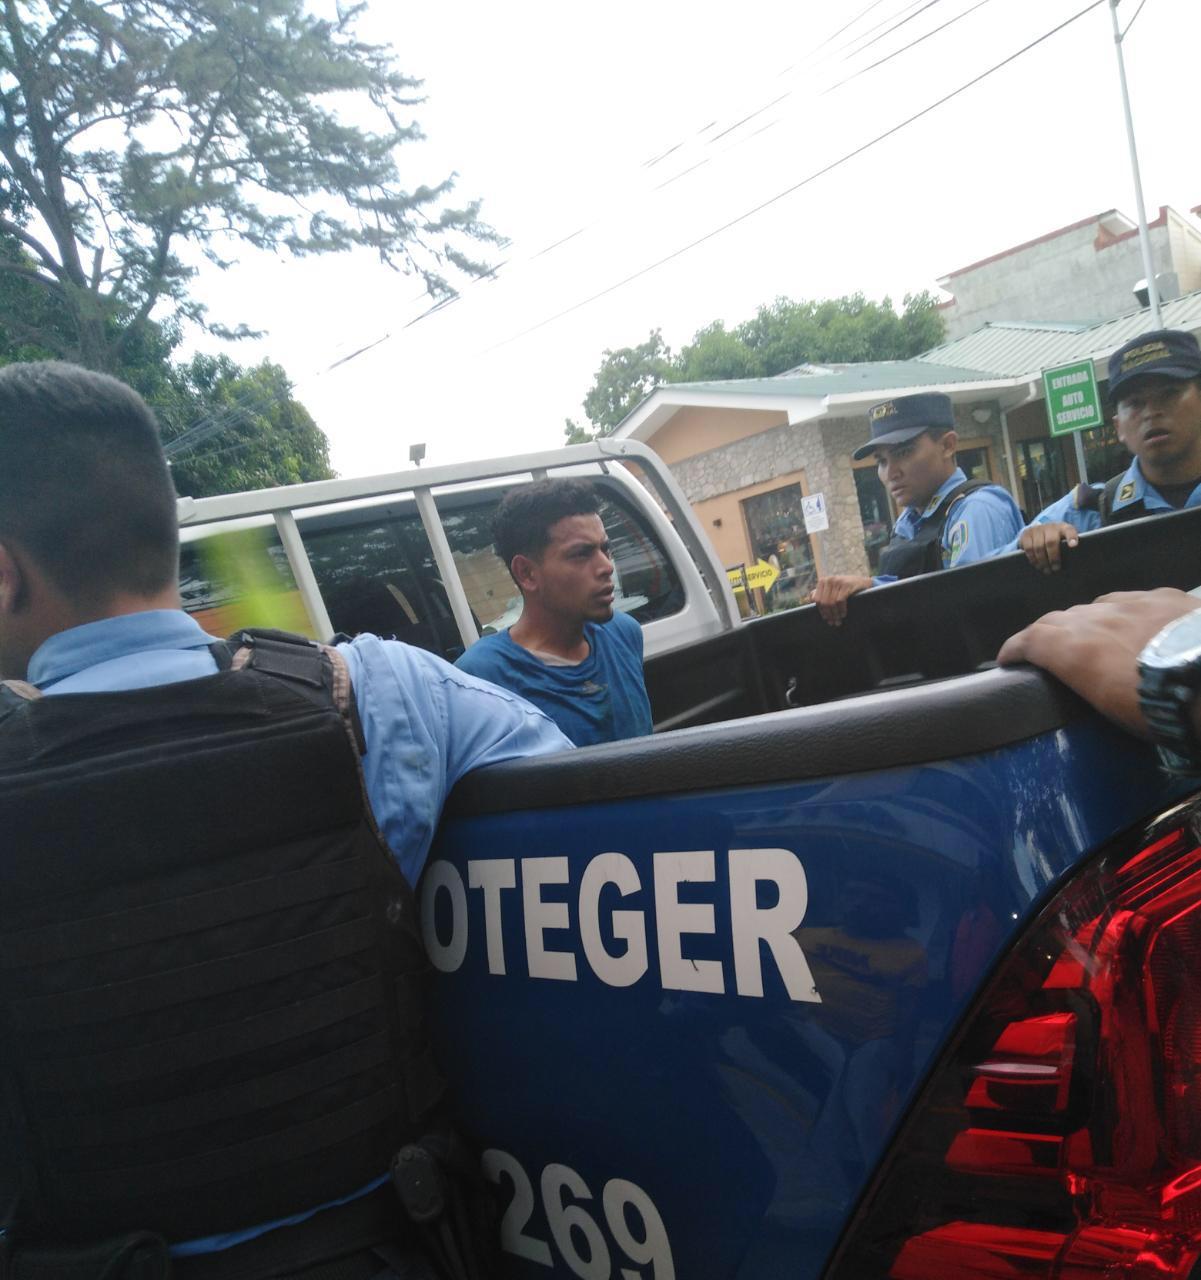 Regresó a Honduras solo para matar a su expareja en San Pedro Sula